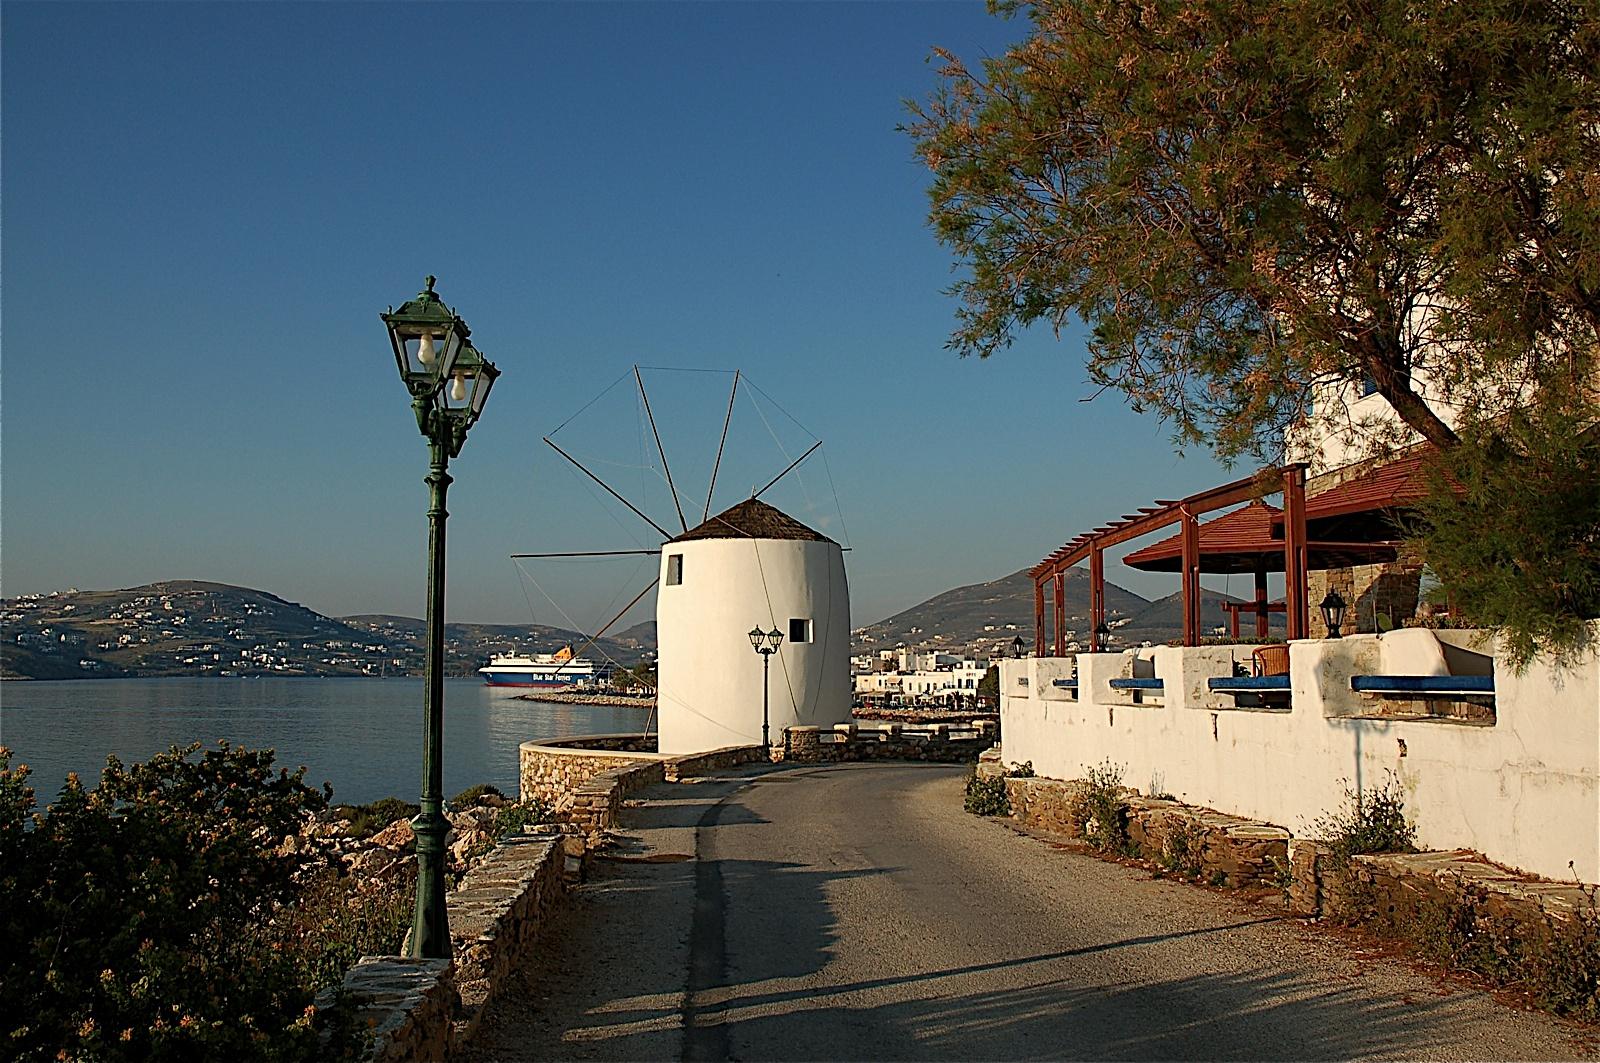 Greece.09.16